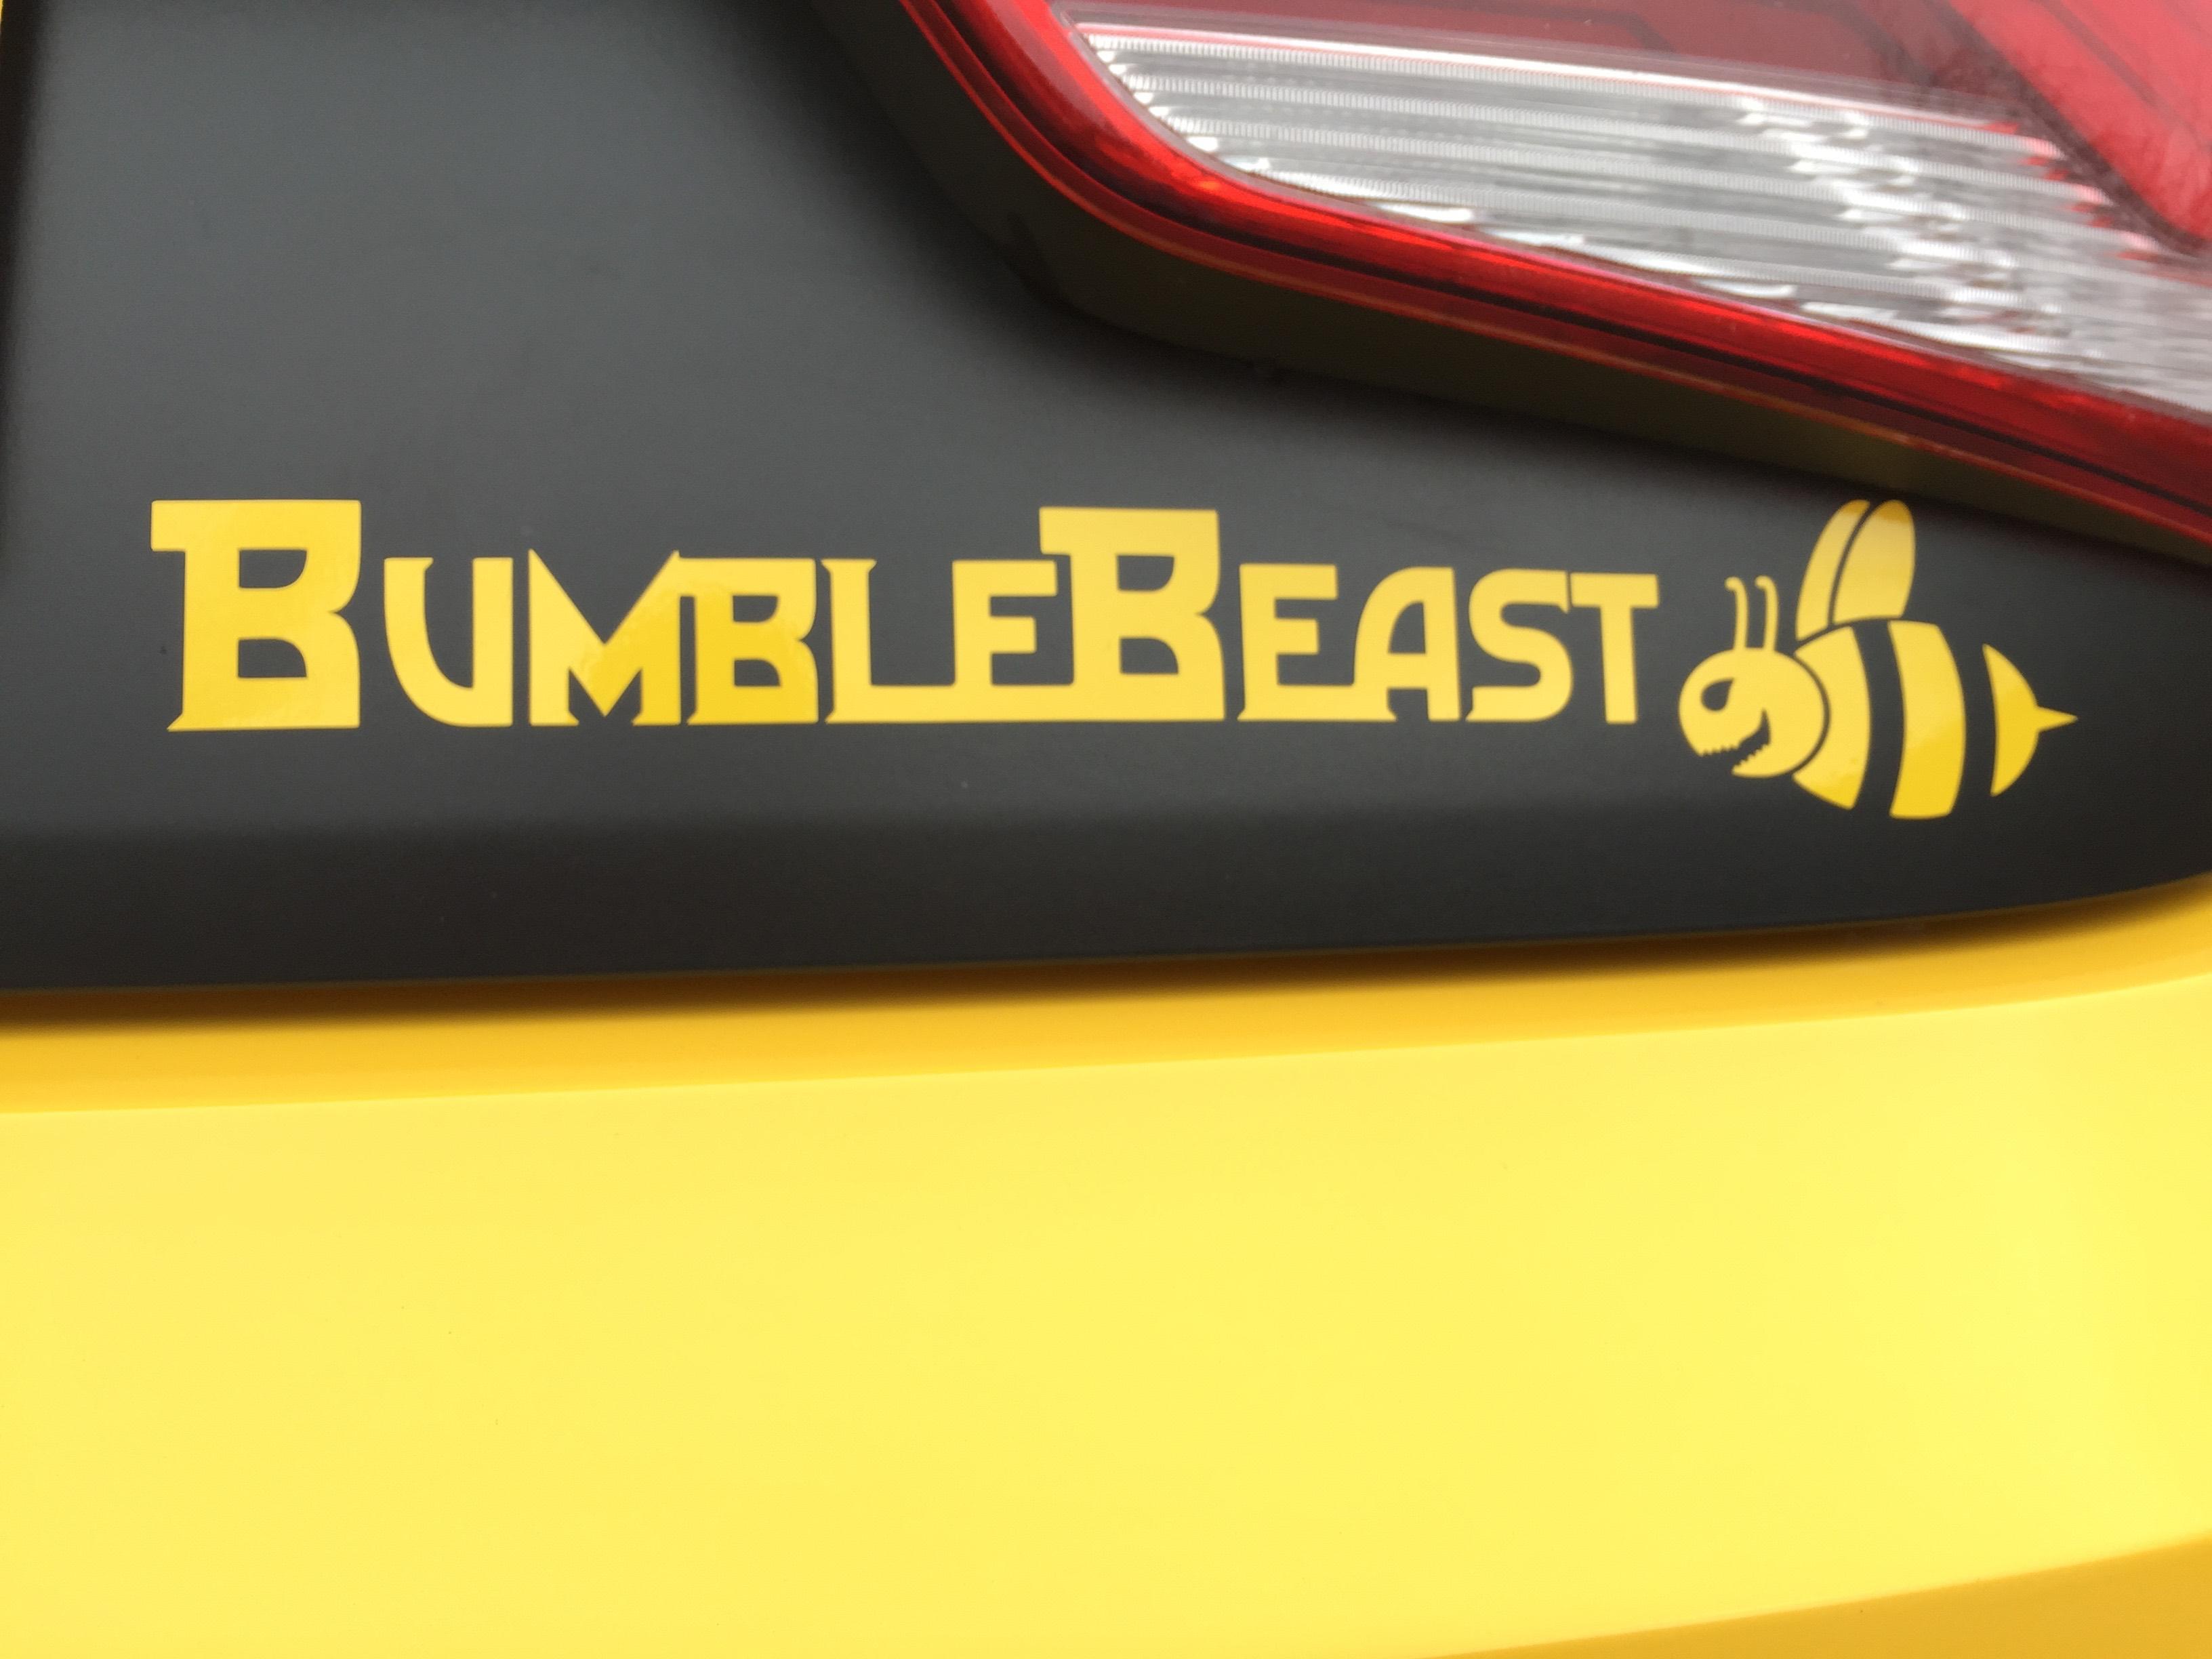 BumbleBeast - 1.jpg